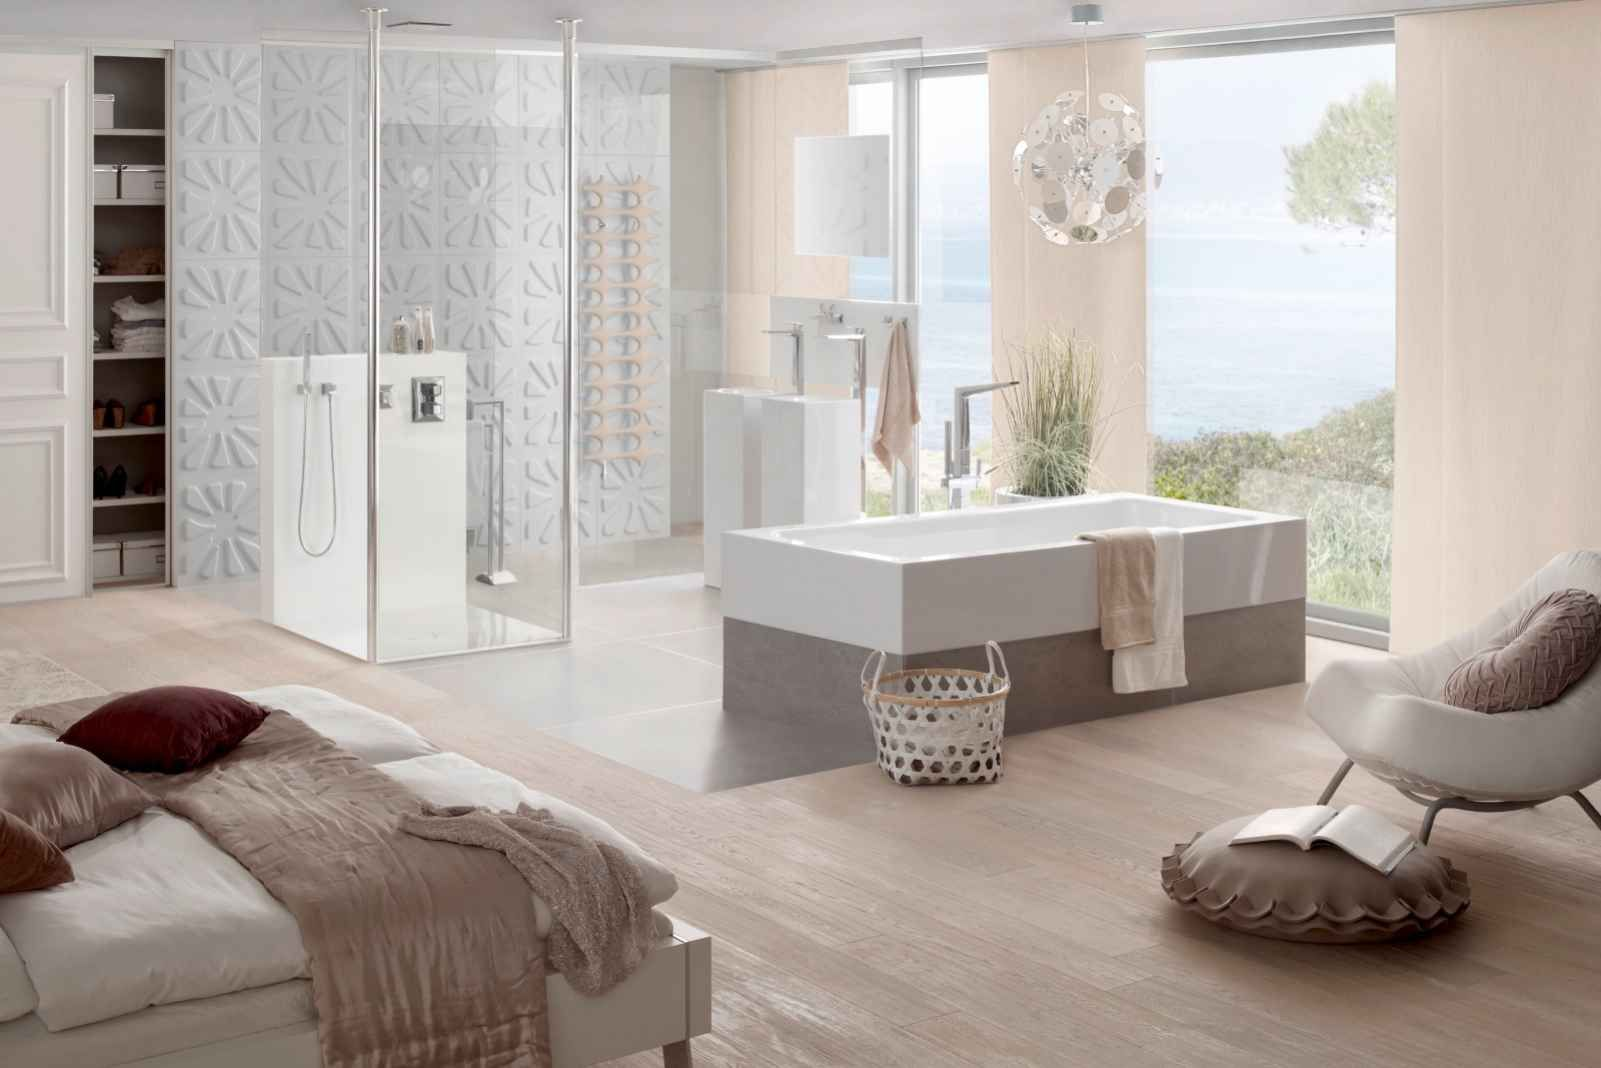 Badezimmer Reuter ~ Badwelt reuter. vitra balance x cm white bath with badwelt reuter